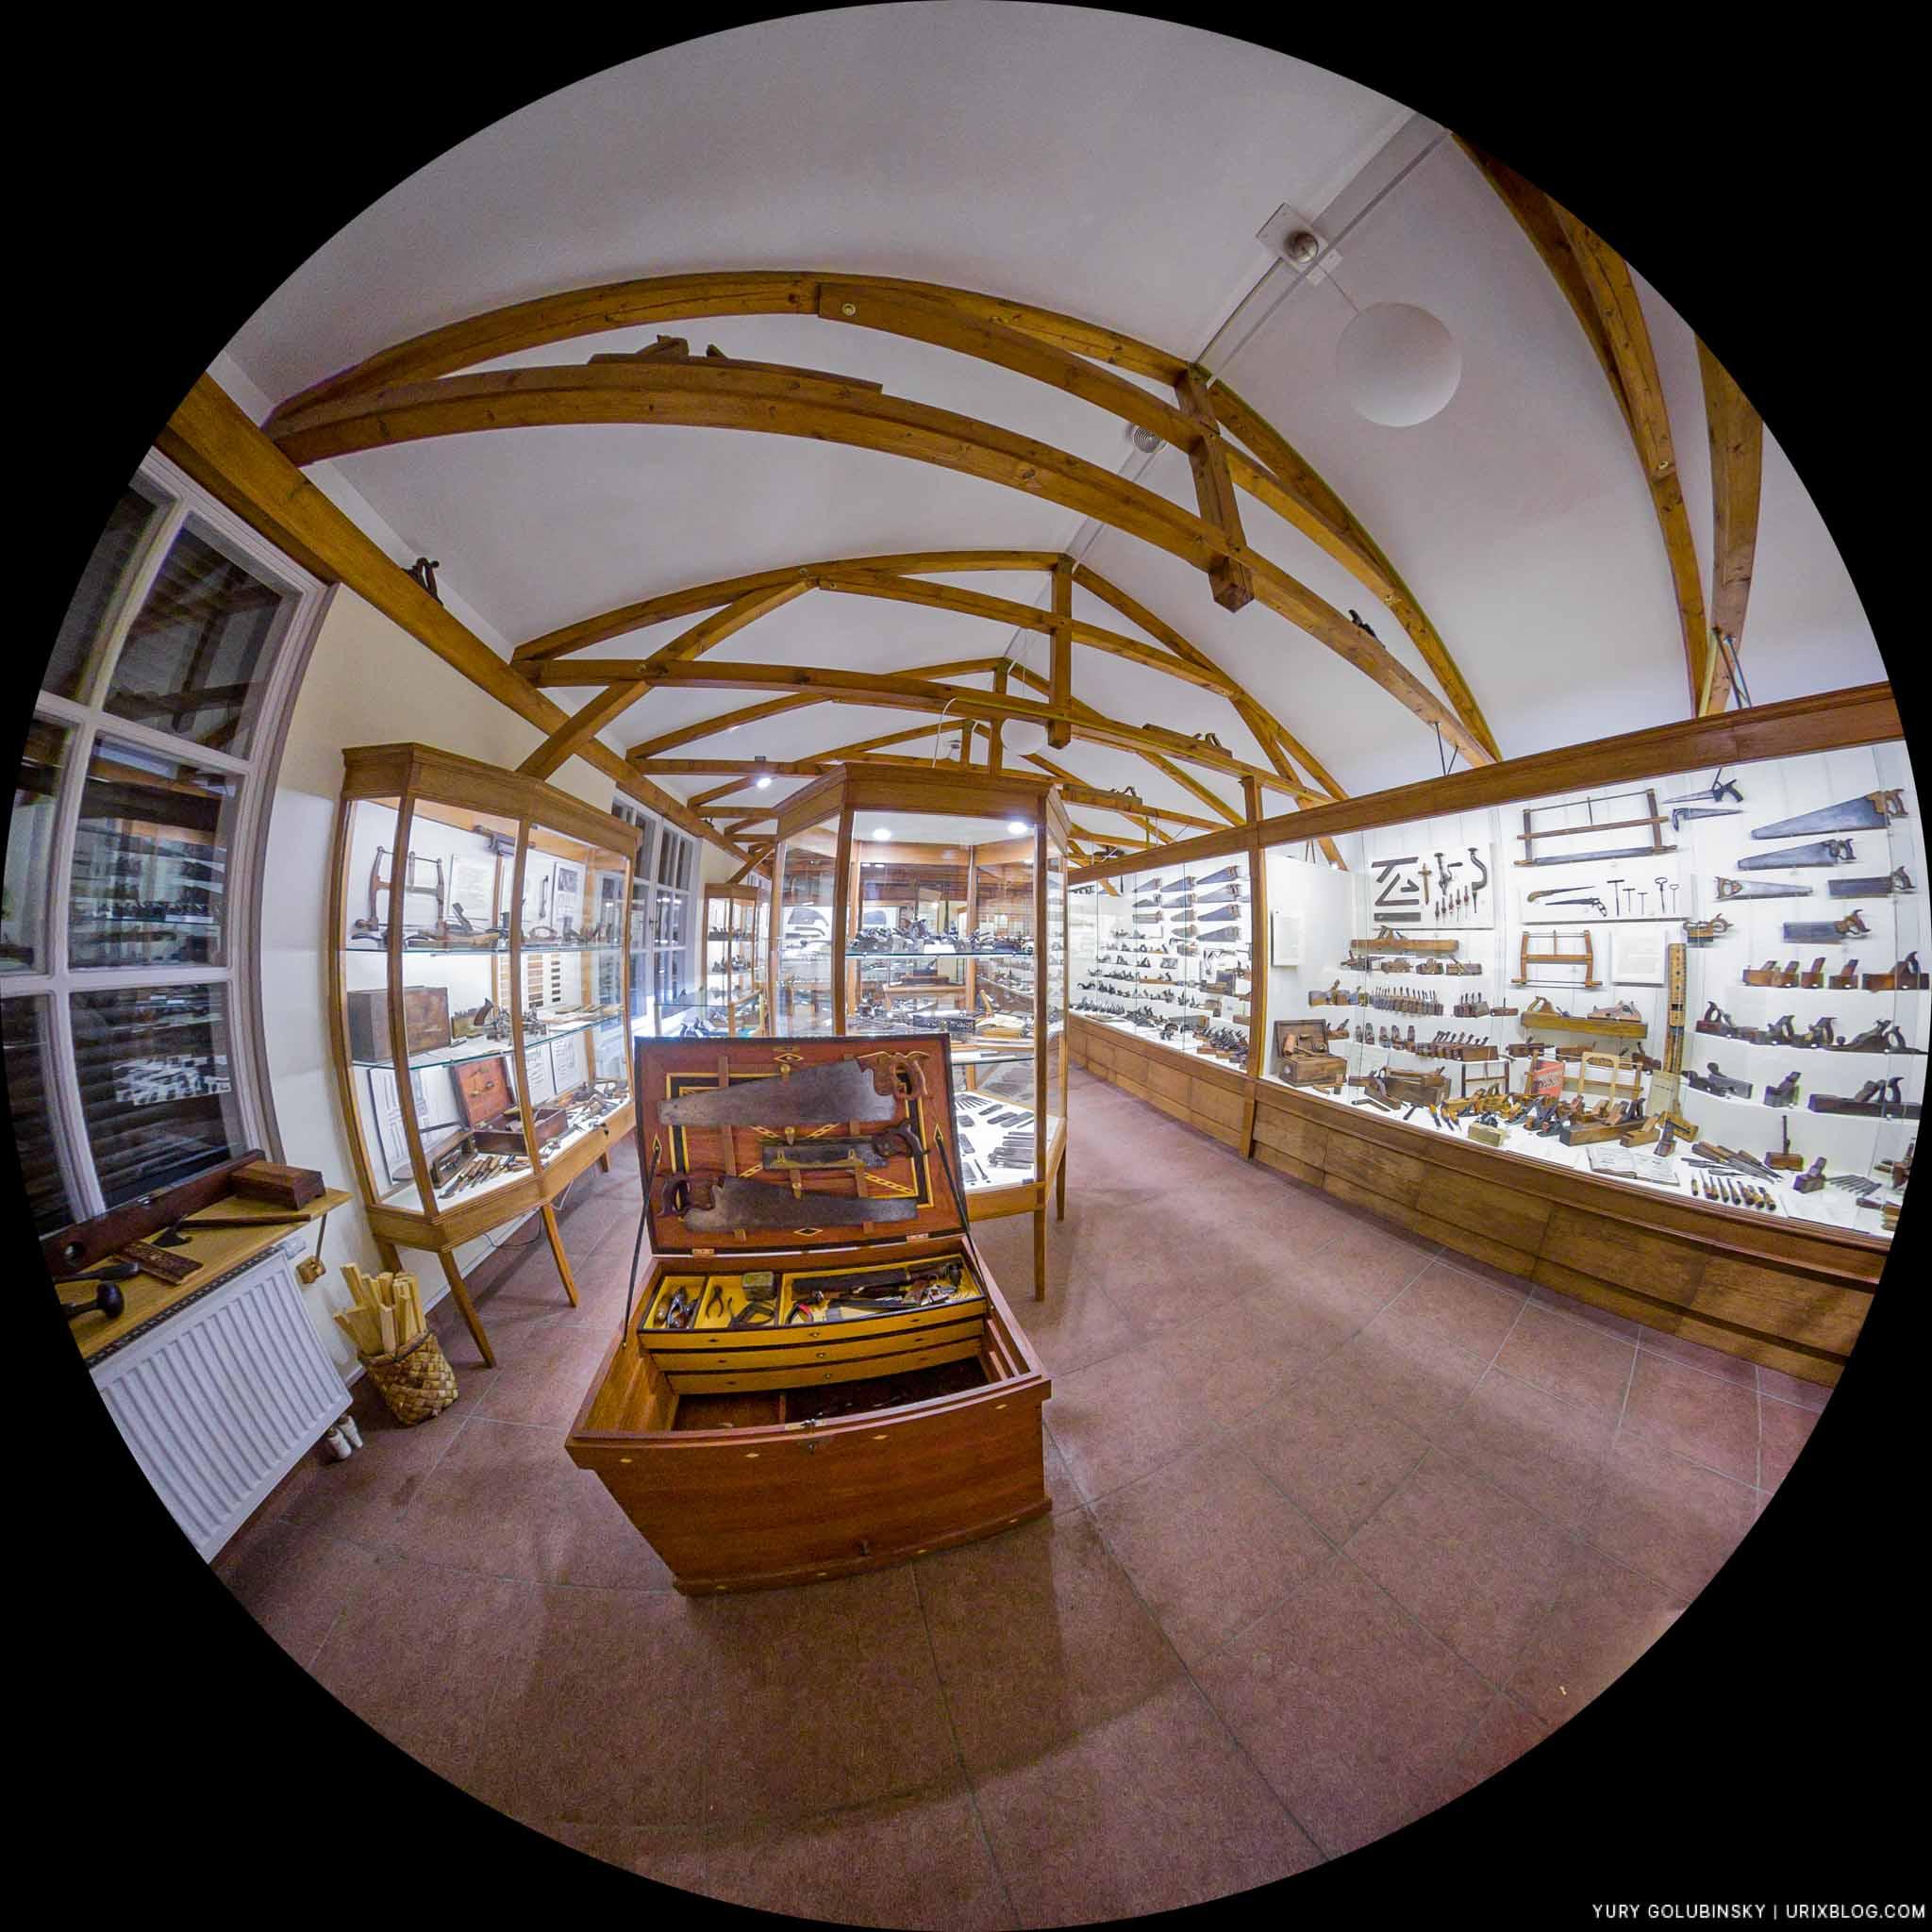 Museum of carpentry tools, Pushkino, Moscow oblast, Russia, museum, carpentry tools, showcase, fisheye, panorama, Insta360 One X, 2019